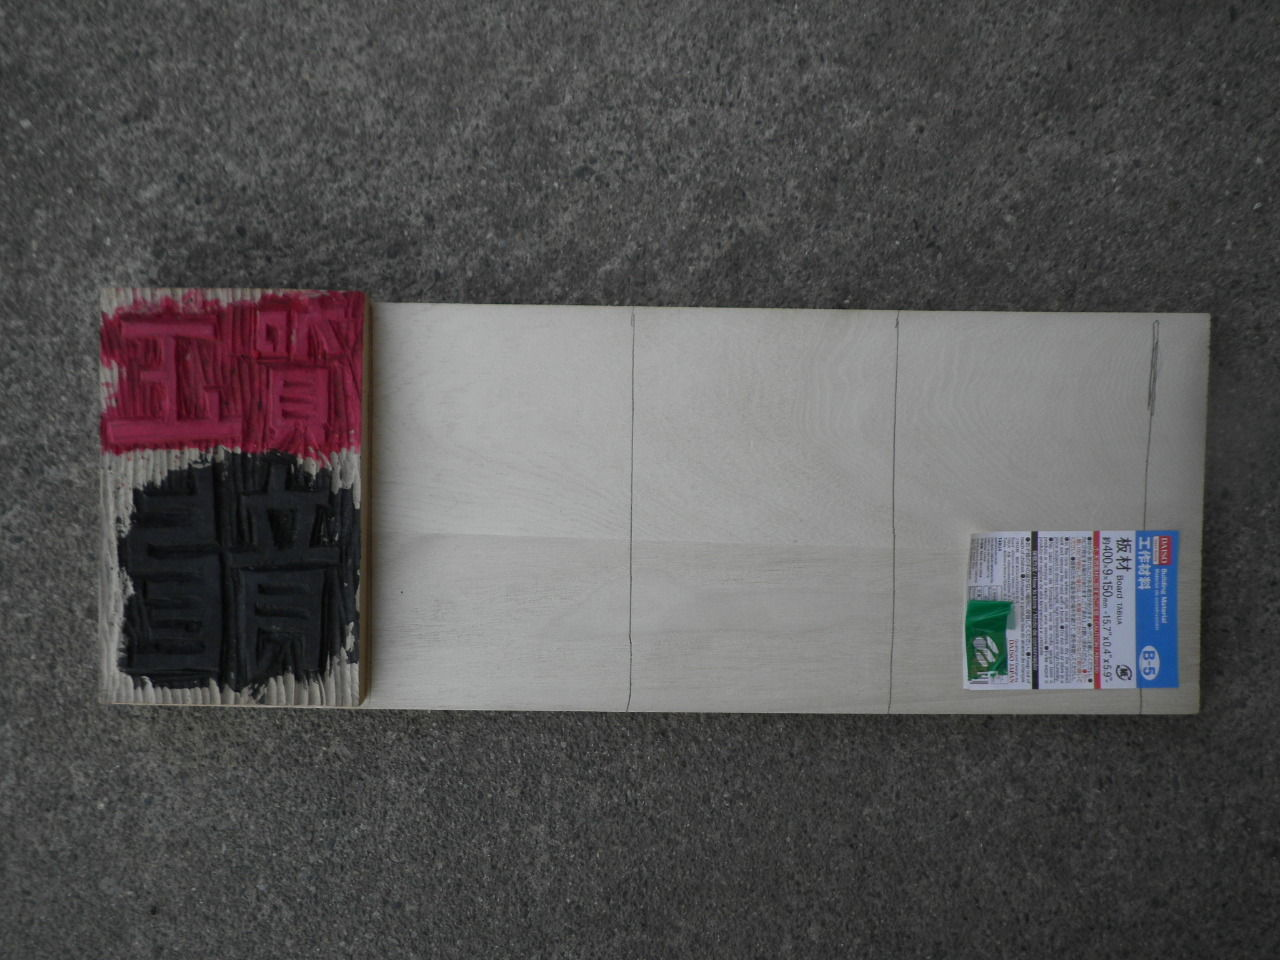 RIMG32966